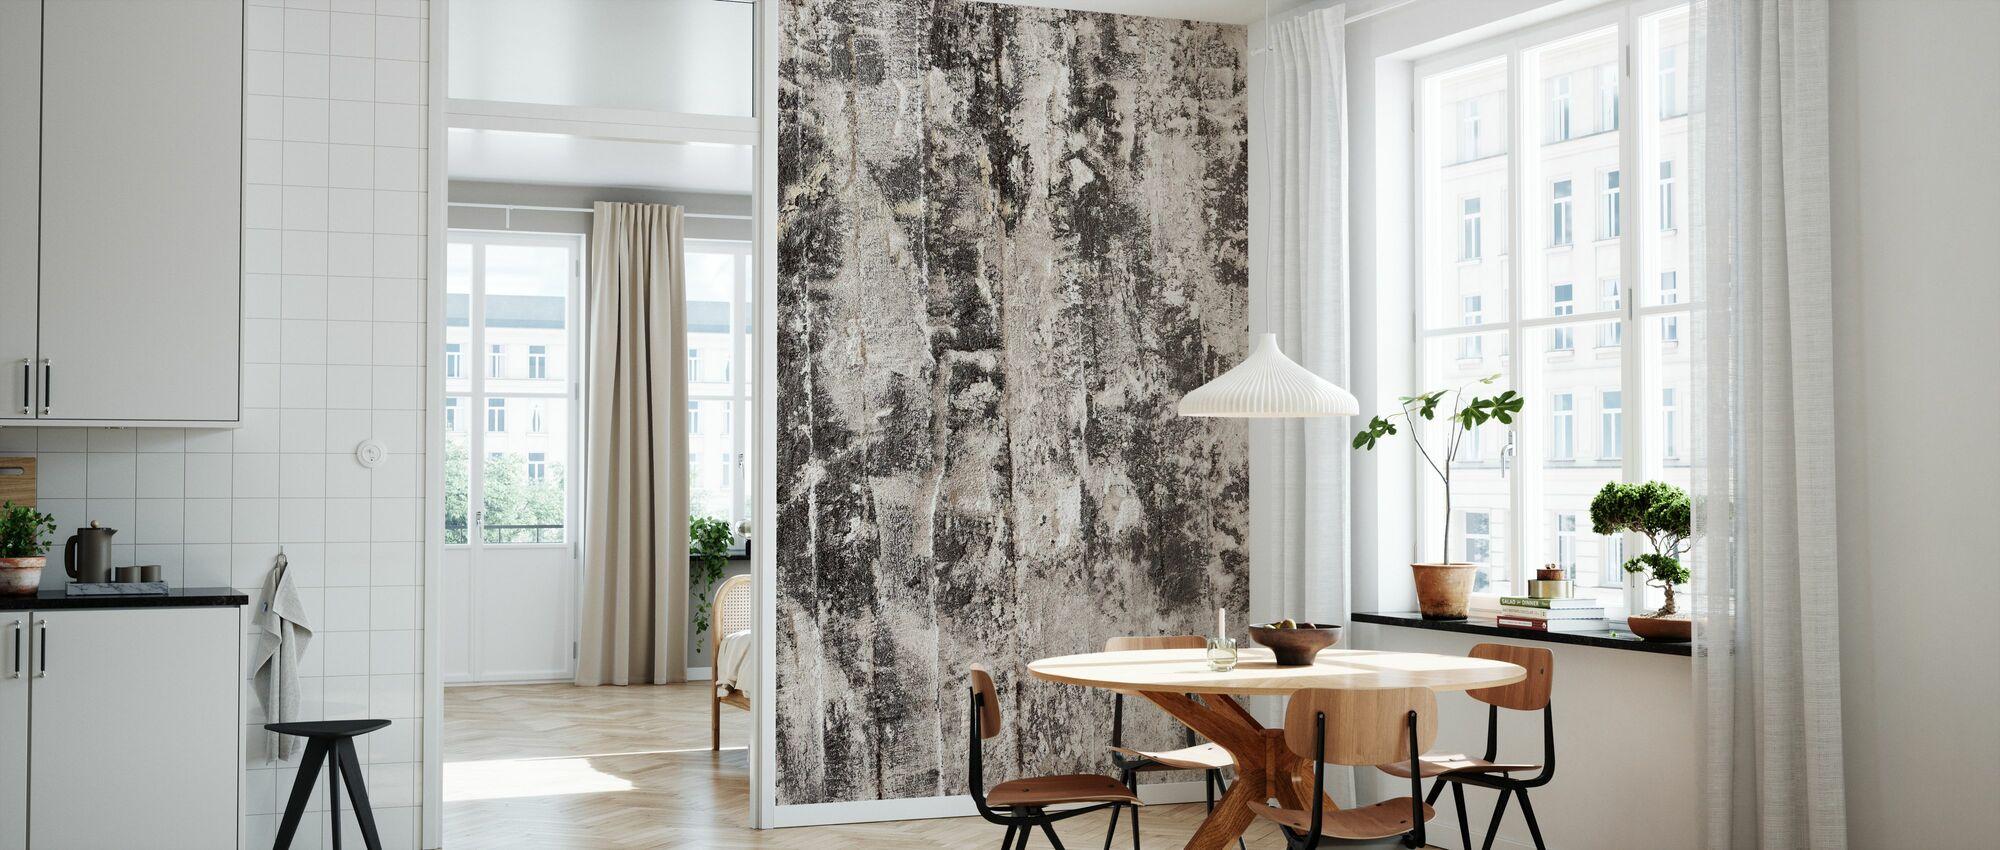 Rough Wall - Wallpaper - Kitchen